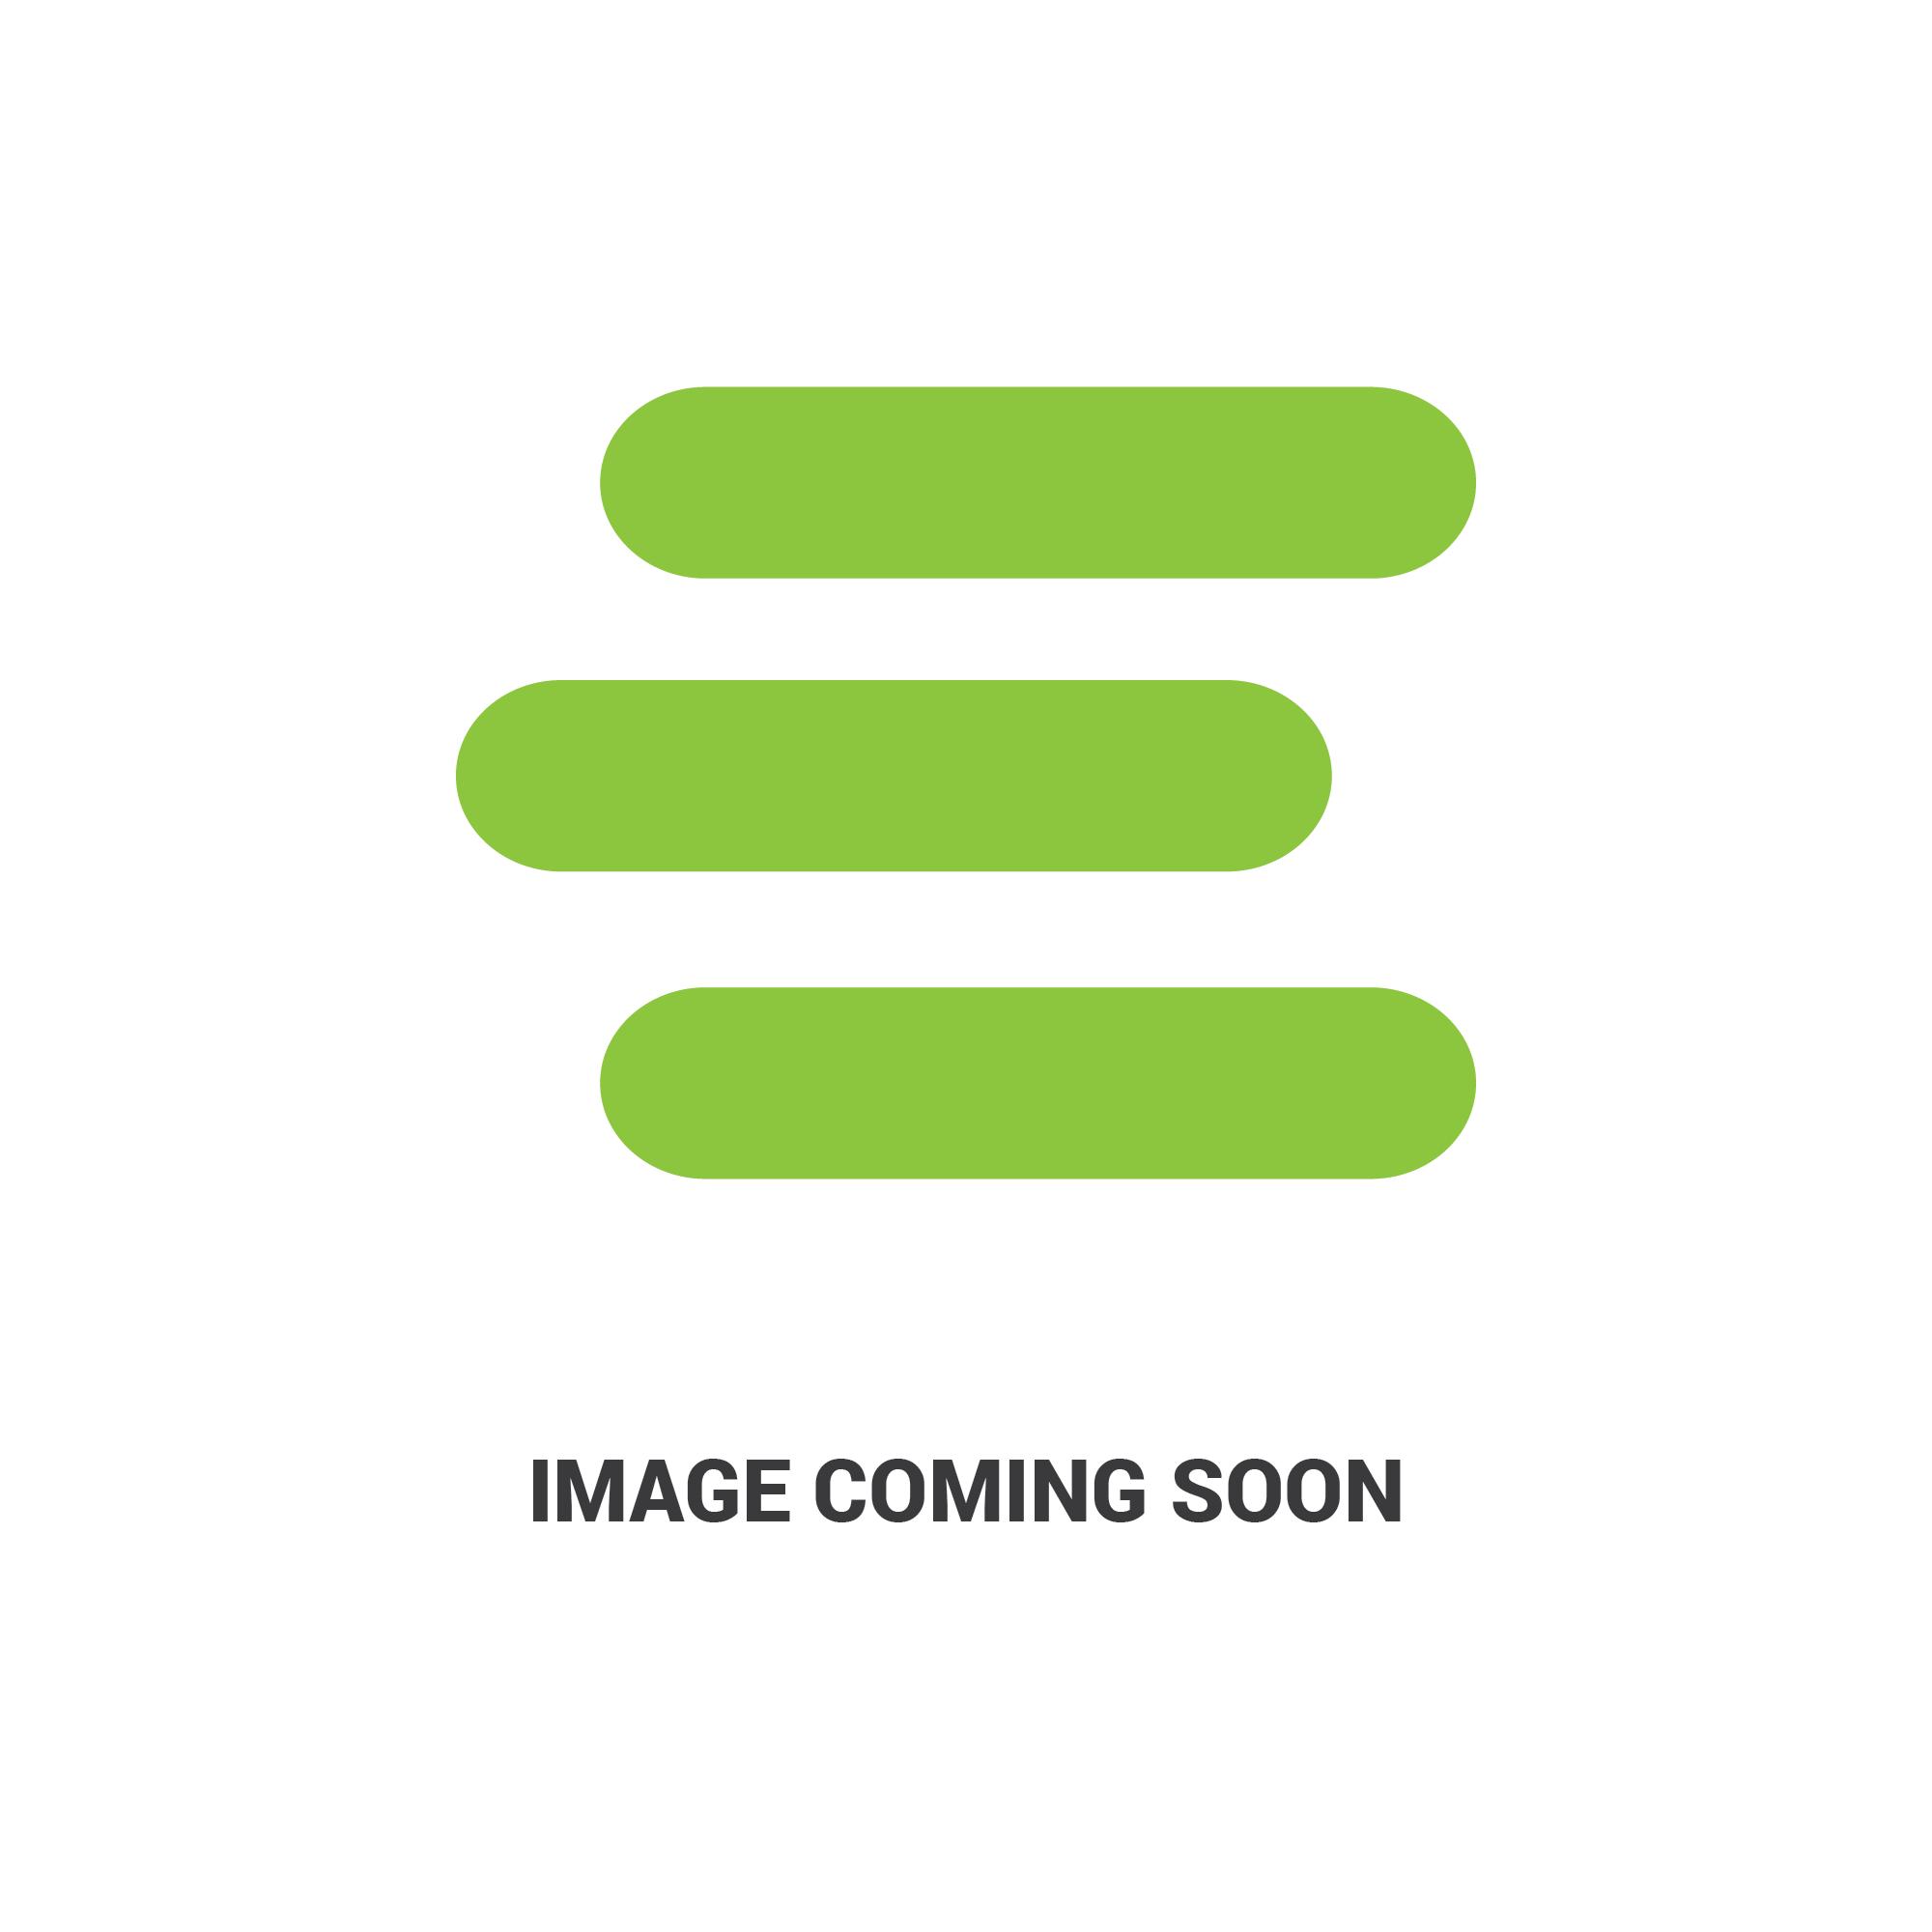 E-6652753edit 1.jpg